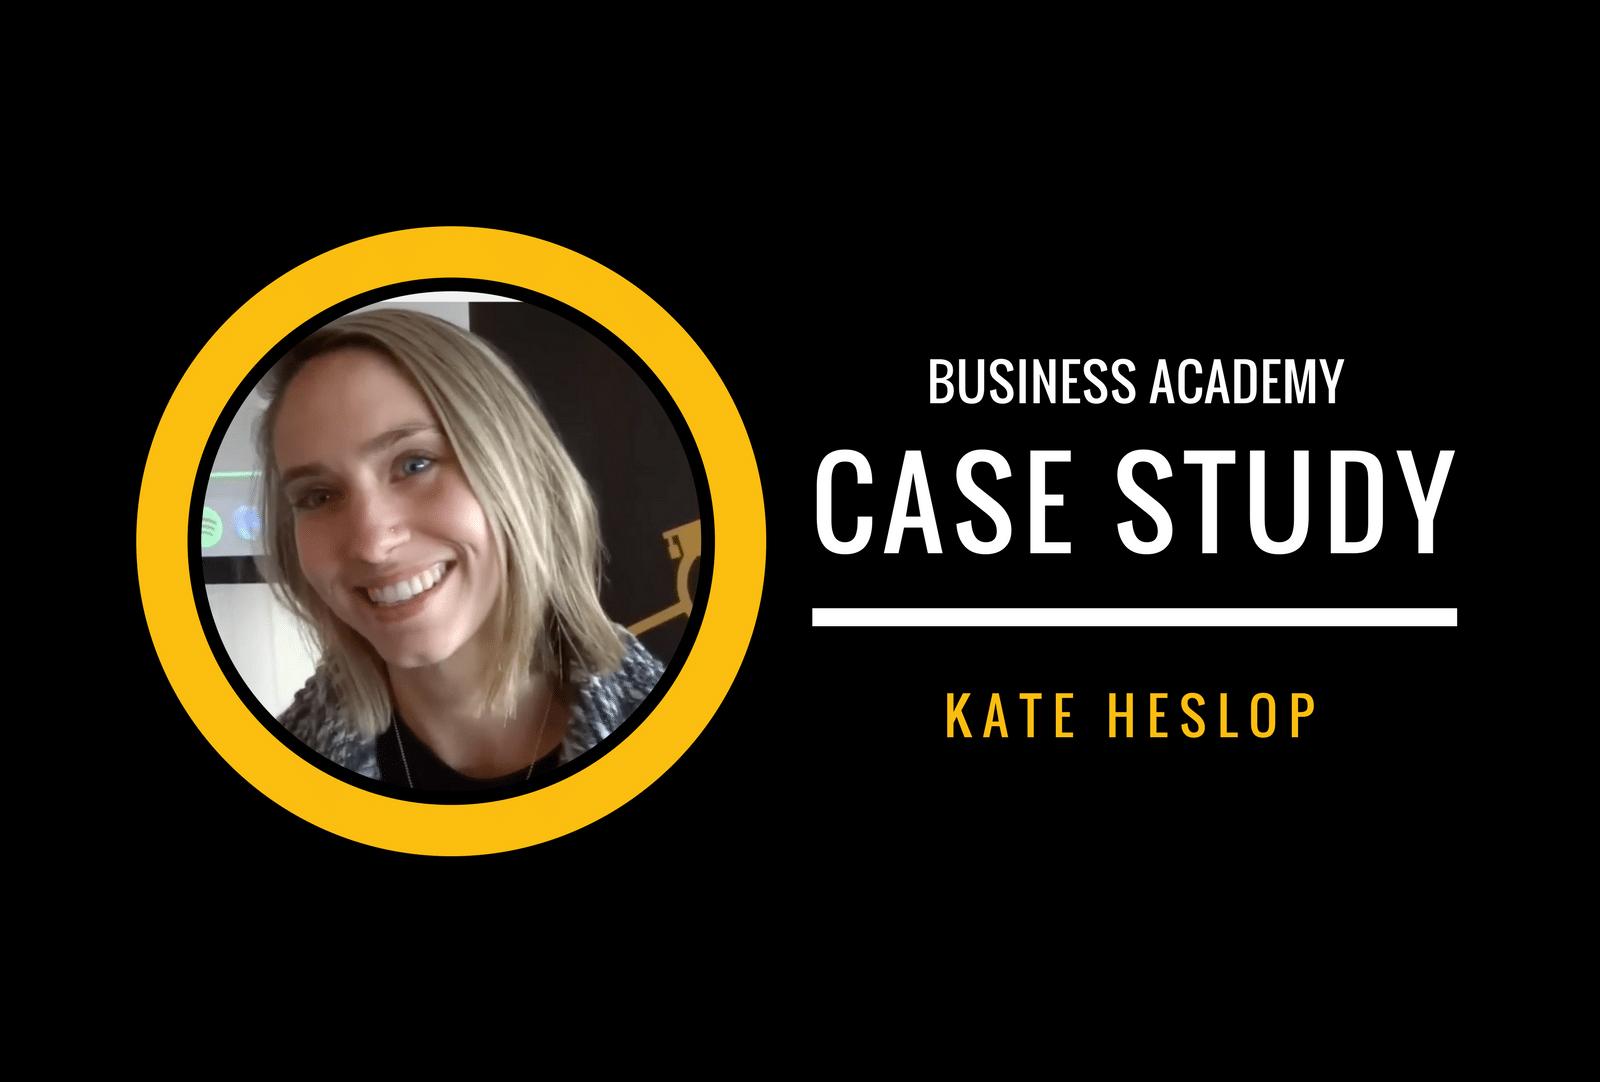 KATE HESLOP CASE STUDY